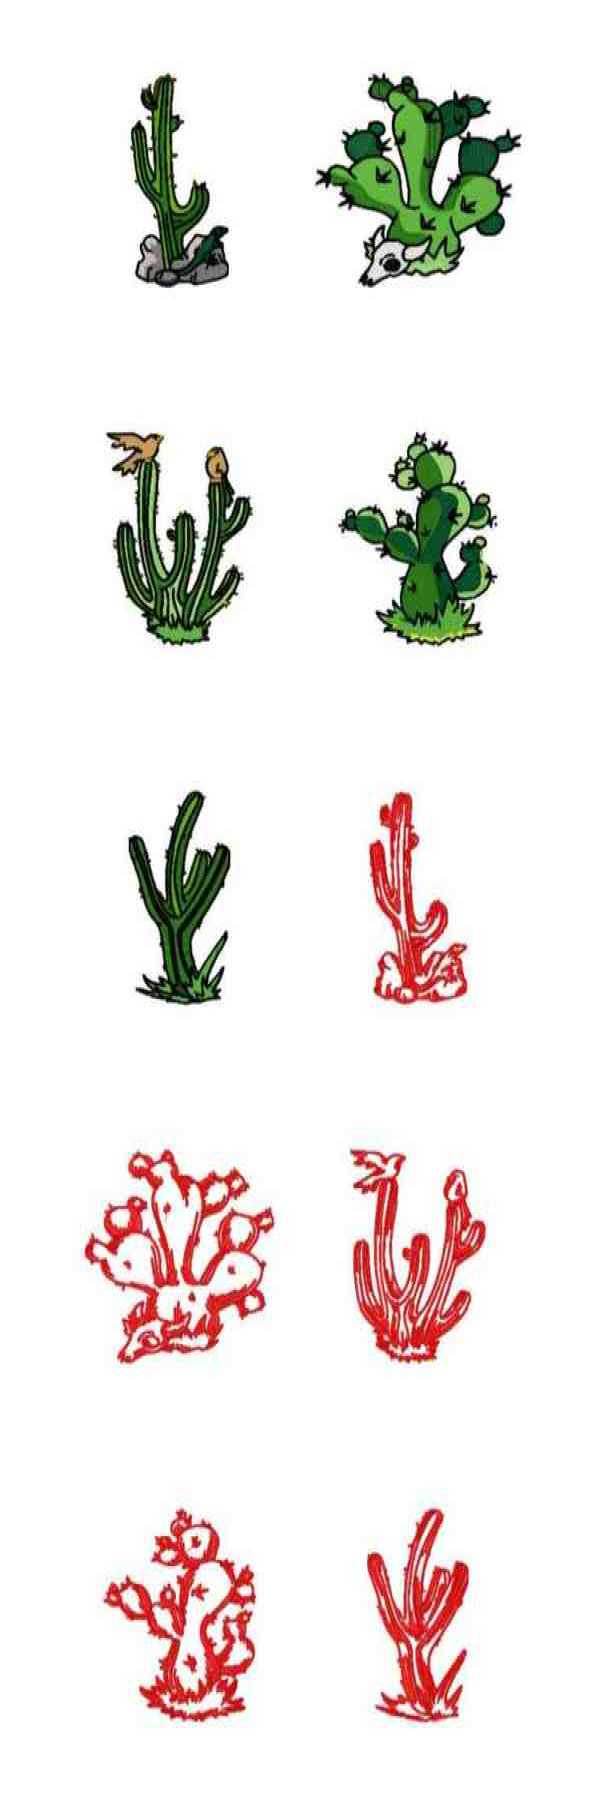 Embroidery machine designs dd western cactus set